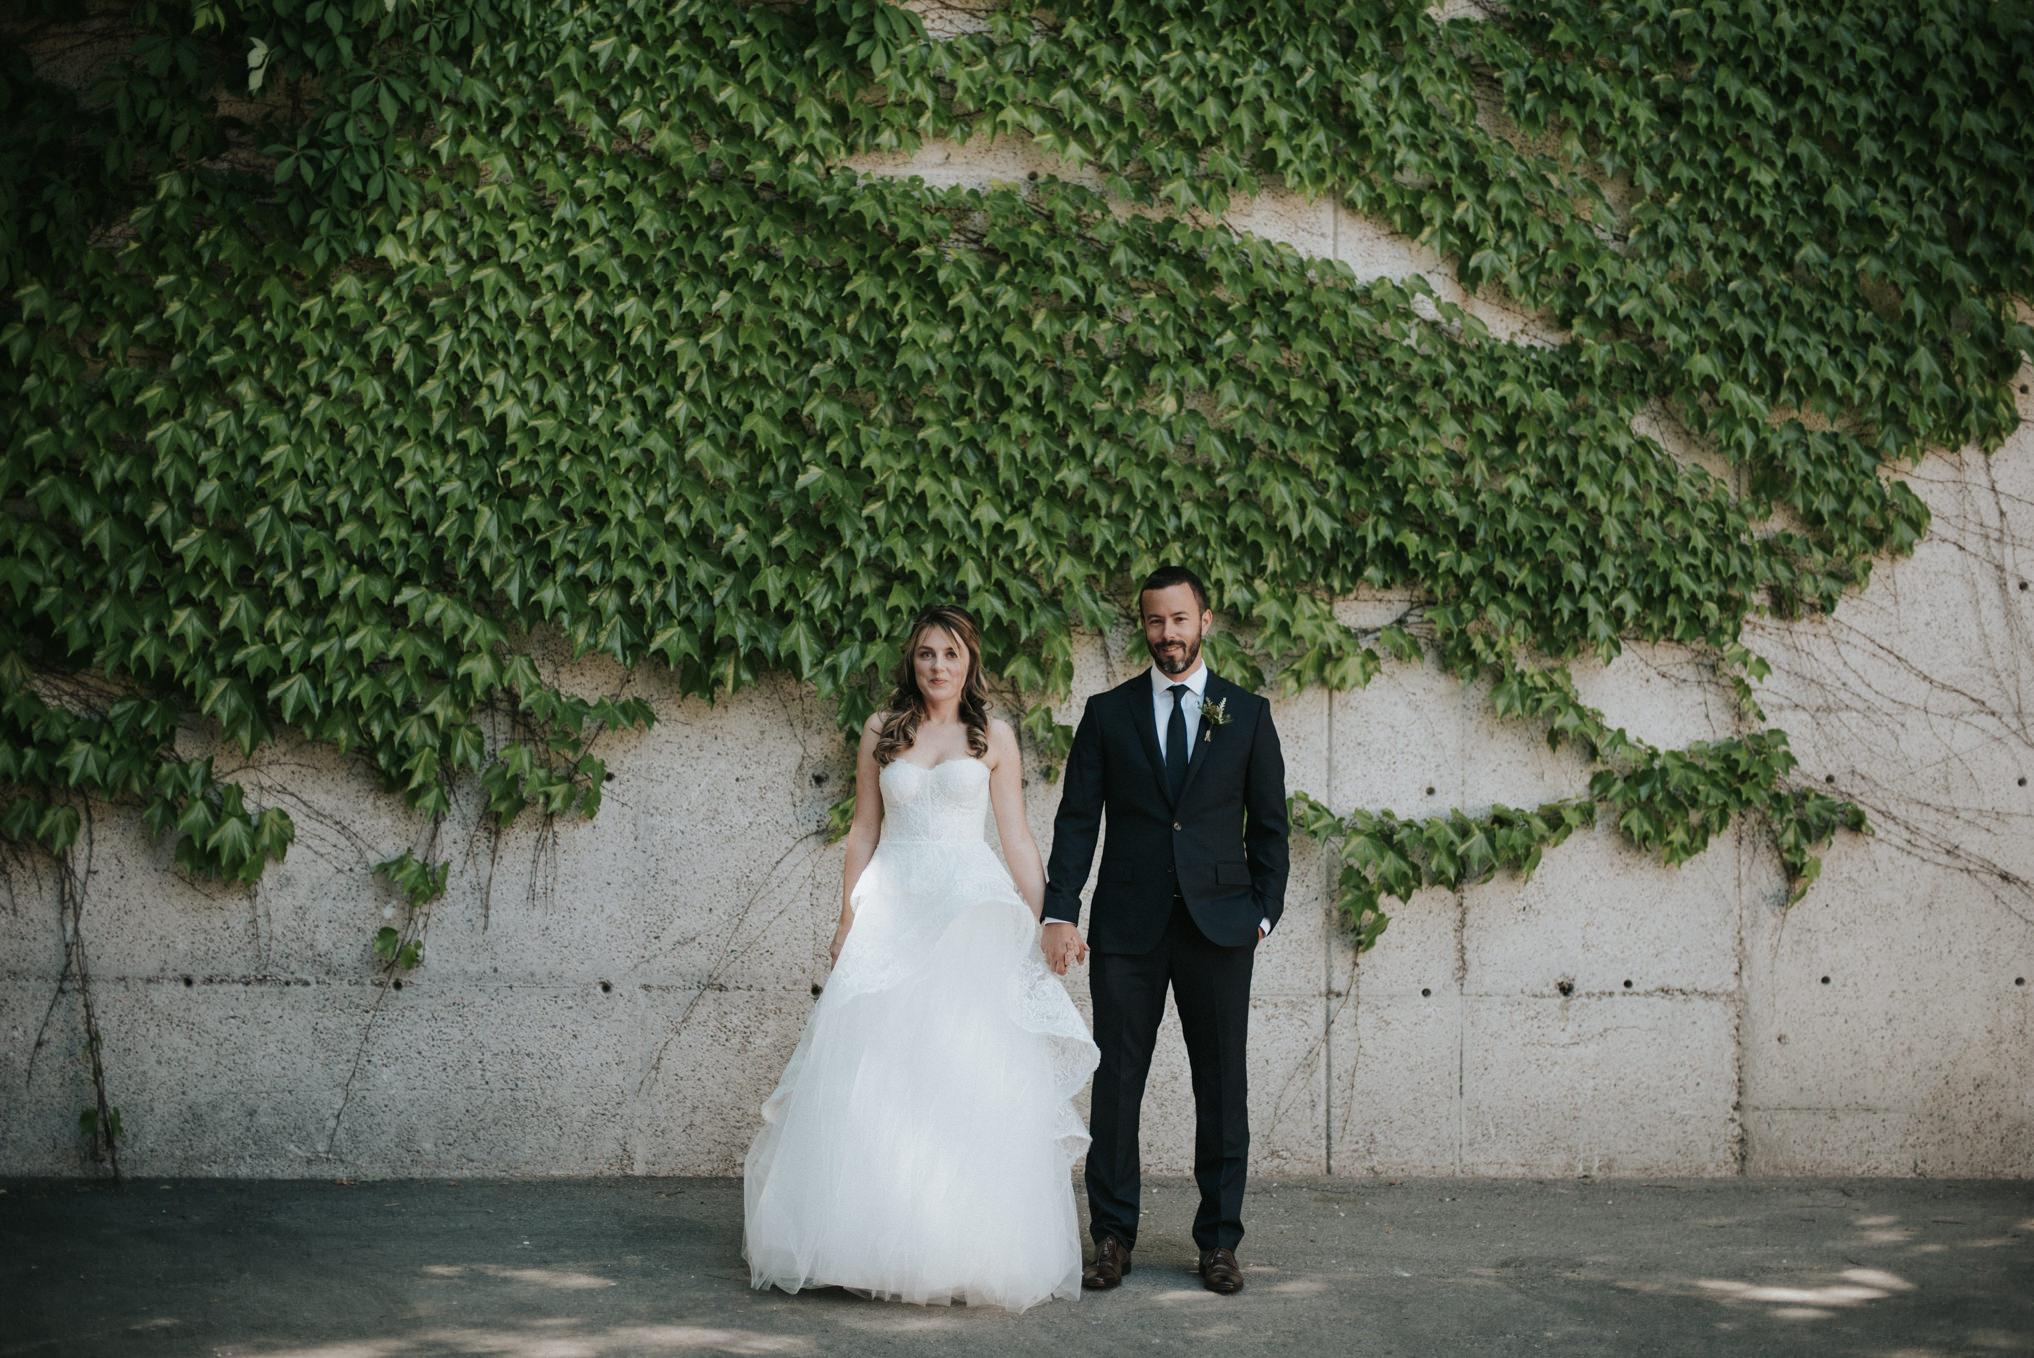 An intimate Auberge du Pommier Wedding in Toronto // Daring Wanderer: www.daringwanderer.com